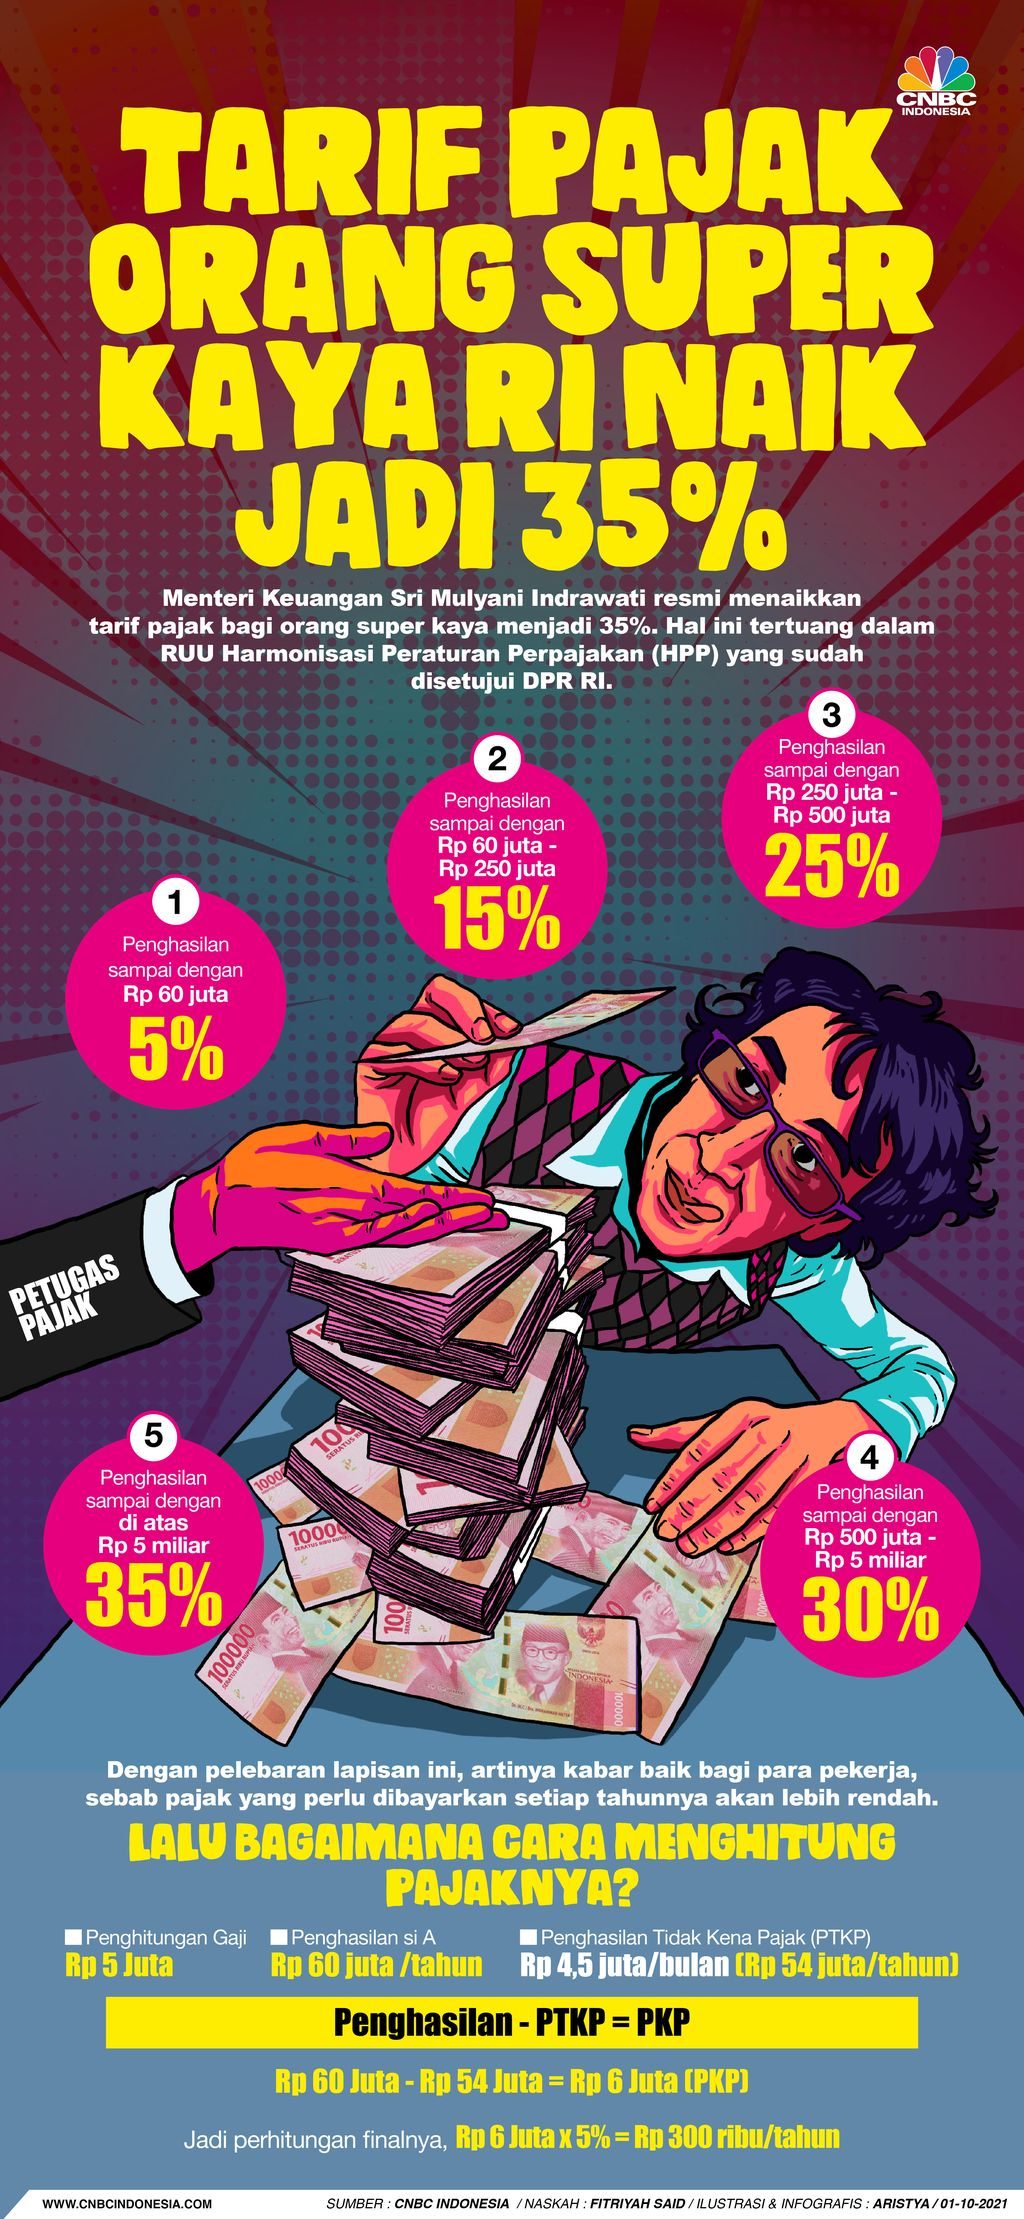 Infografis/Tarif Pajak Orang Super Kaya RI Naik Jadi 35%/Aristya Rahadian